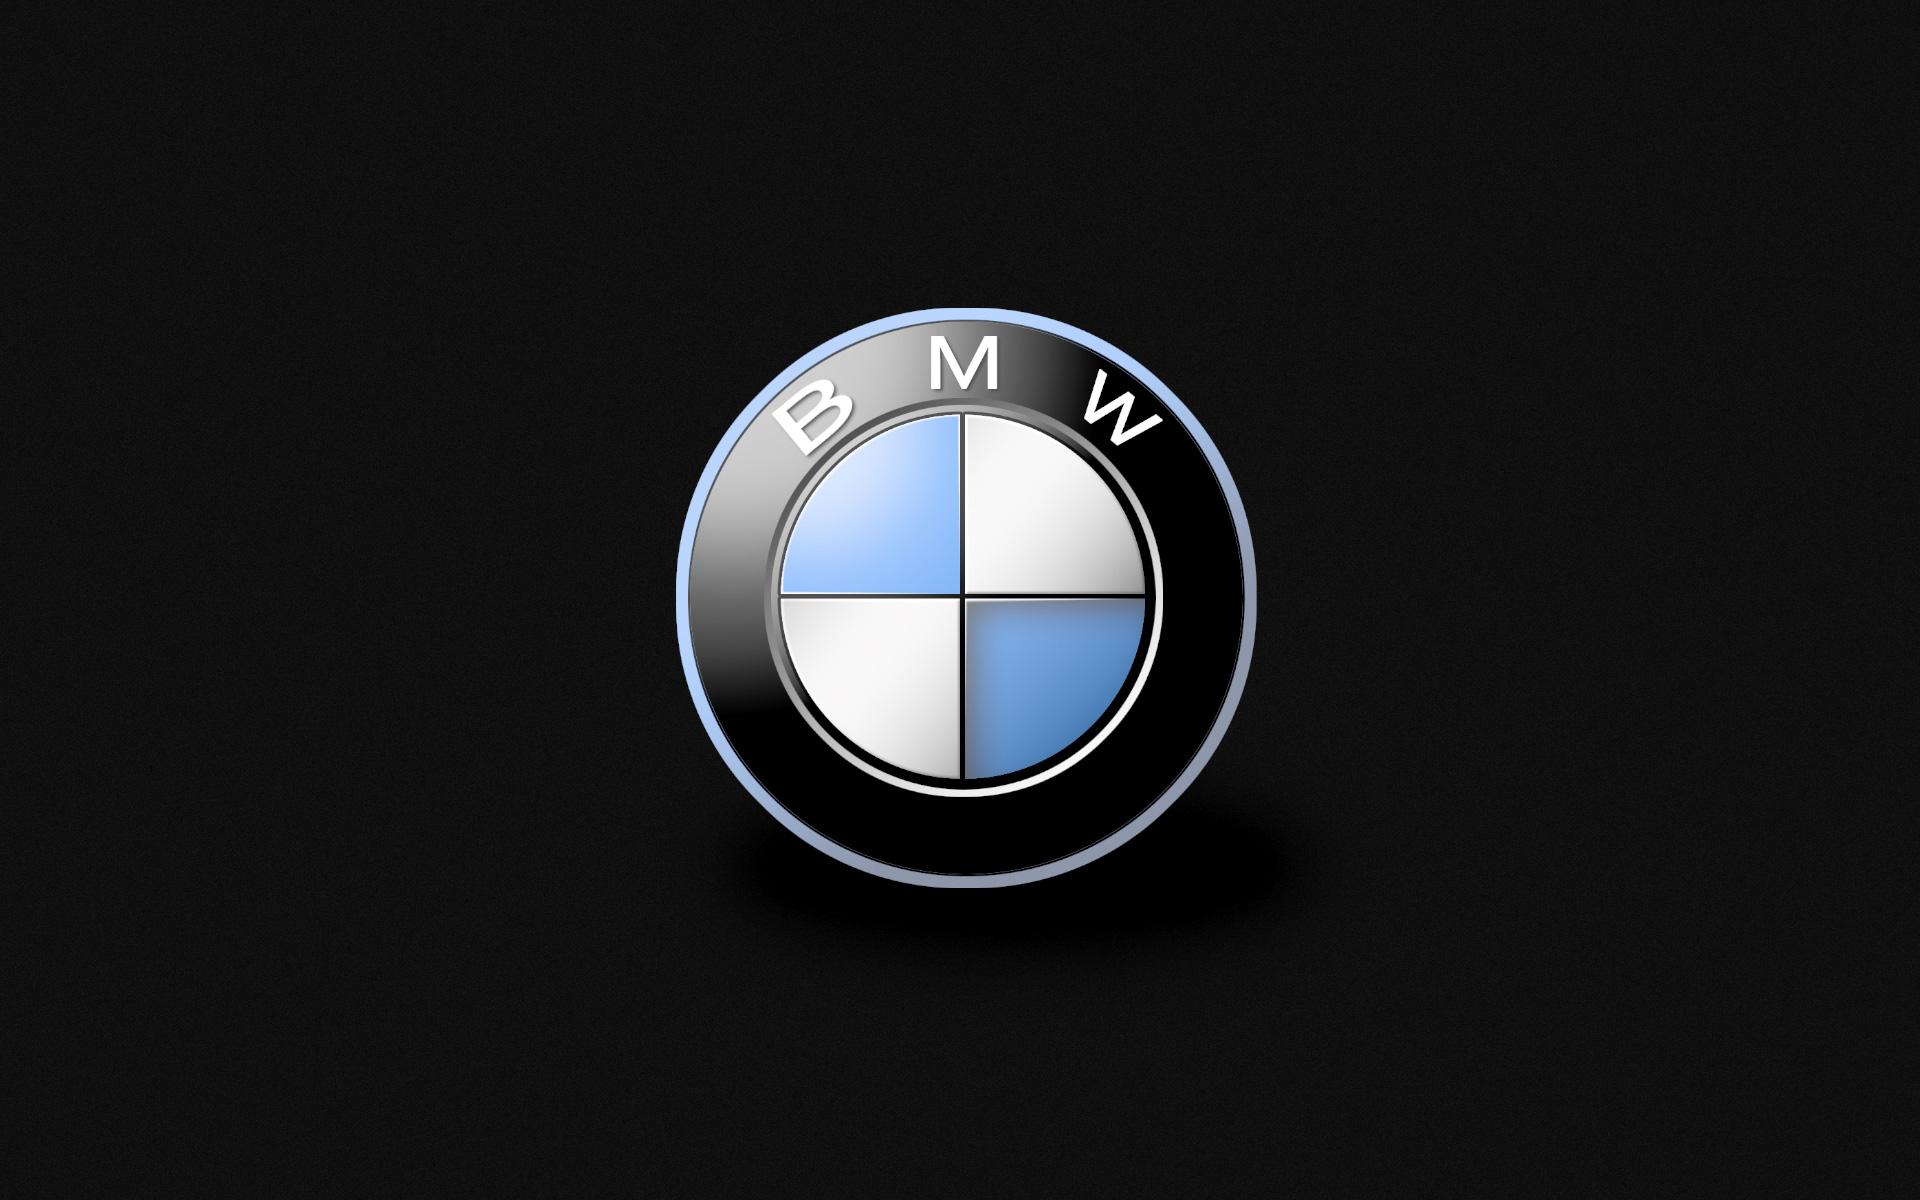 Great for windows, linux, android, macos operating systems. BMW Logo Desktop Wallpaper   PixelsTalk.Net